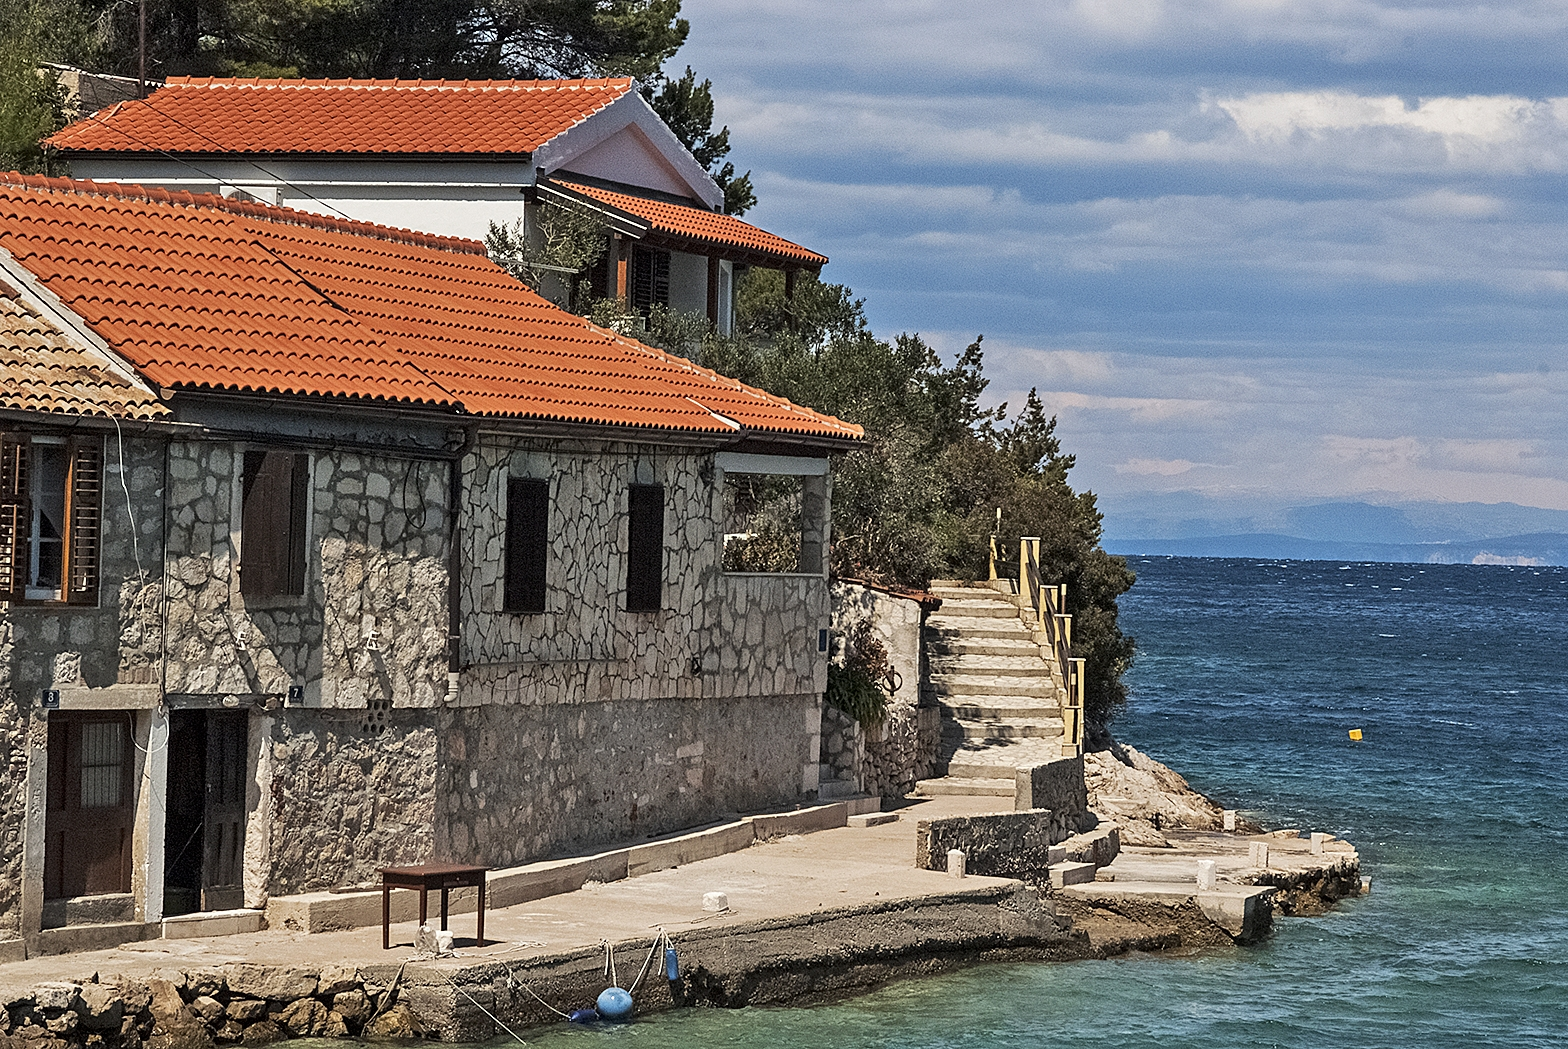 IL - Baai Stoncica (Vis) - Vakantiehuizen, villa´s Kroatië - huis